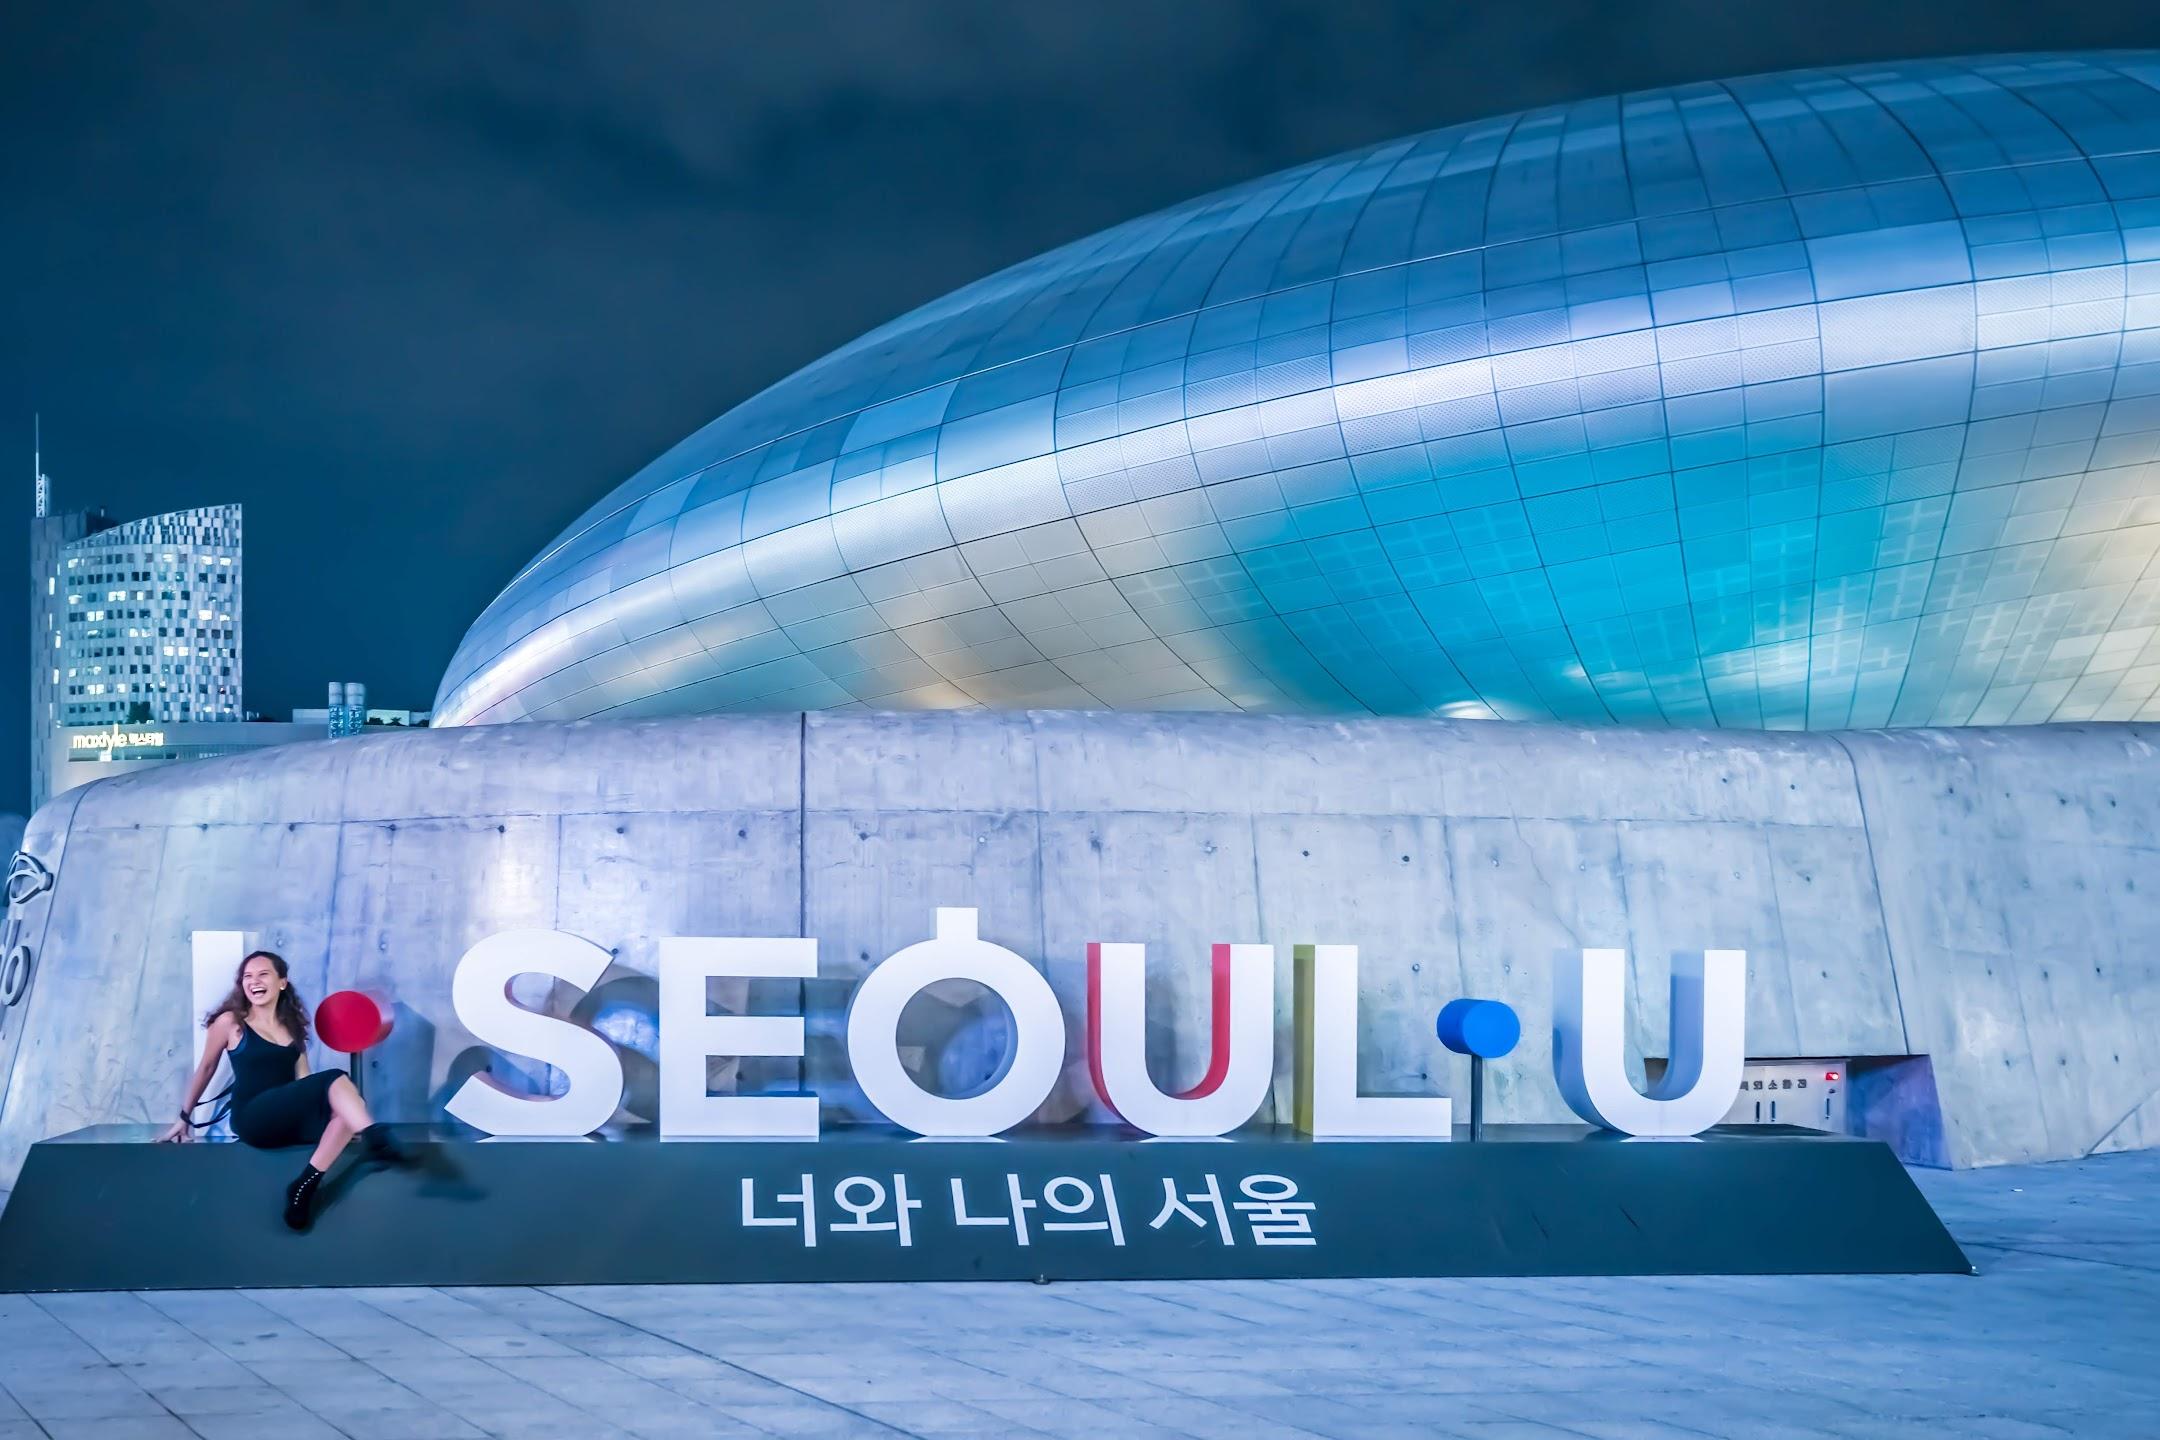 Seoul Dongdaemun Design Plaza (DDP)2